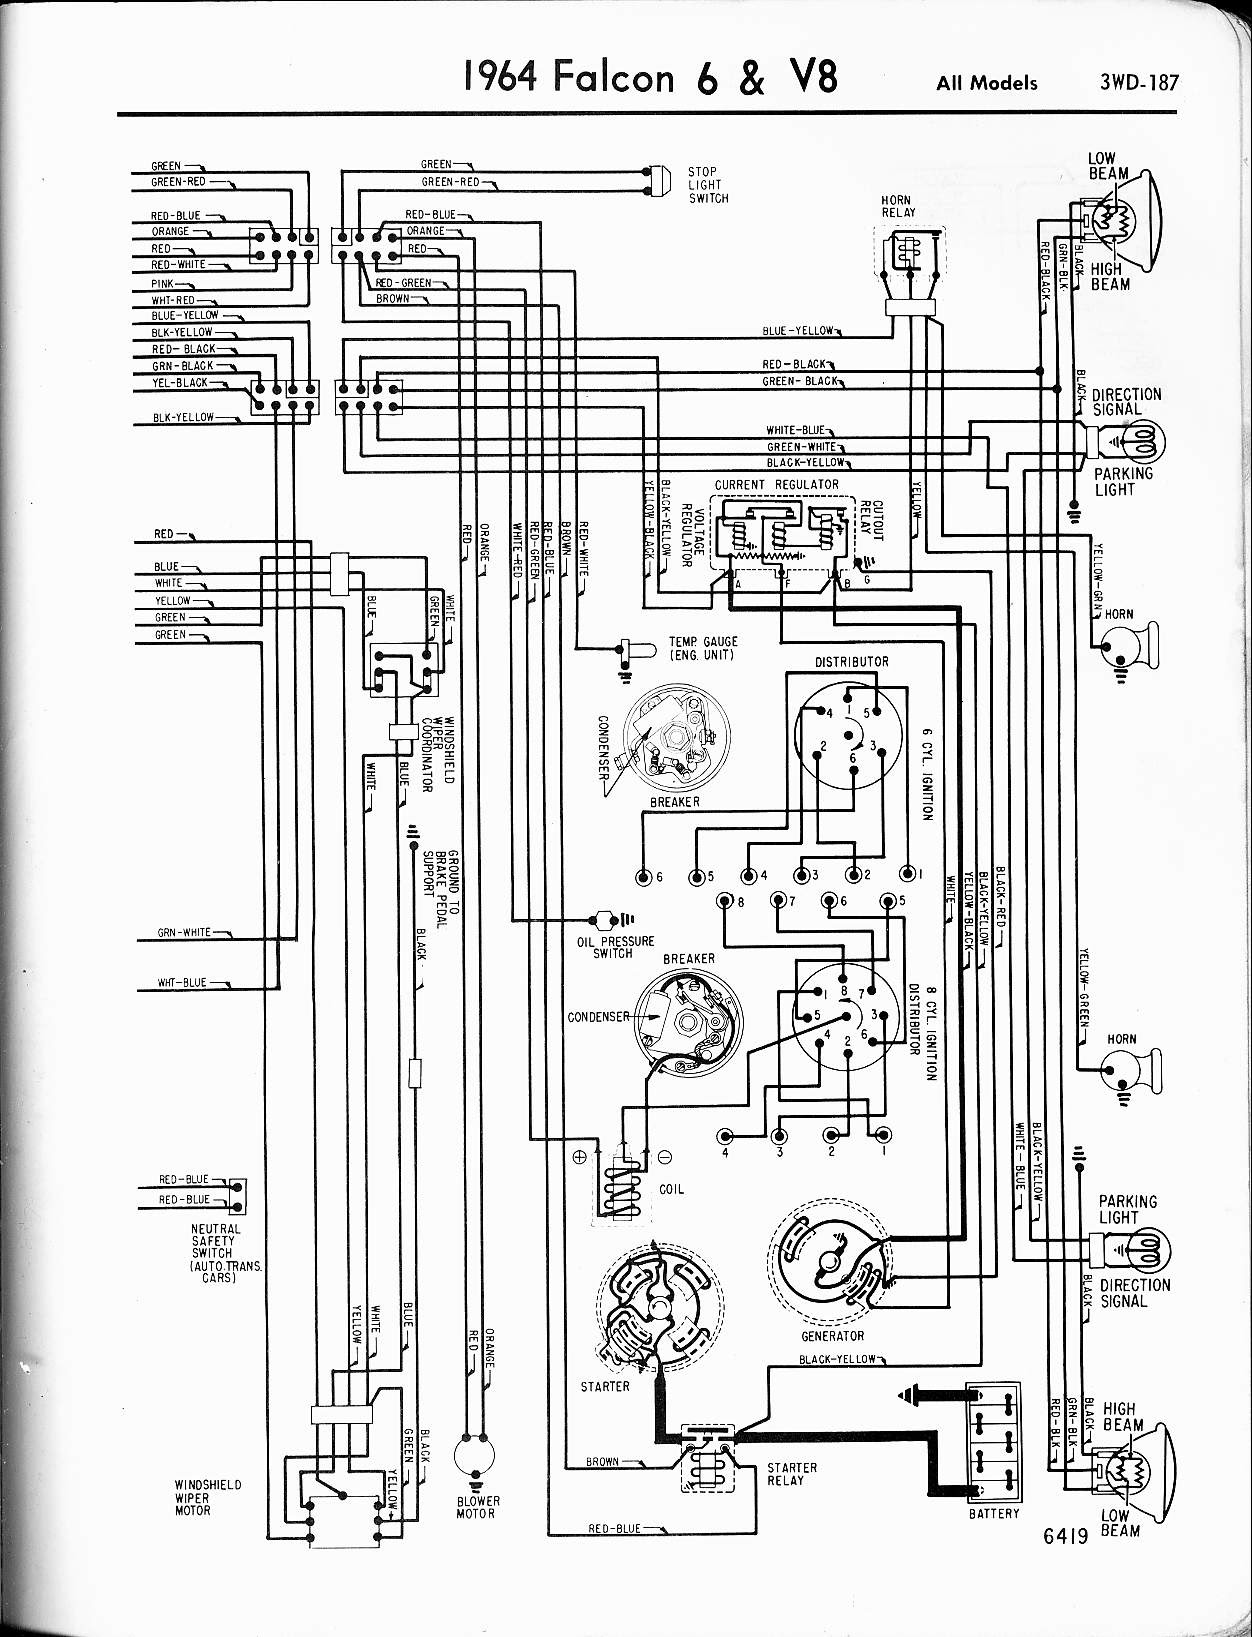 1967 Ford Falcon Wiring Diagram Wiring Diagram View A View A Zaafran It